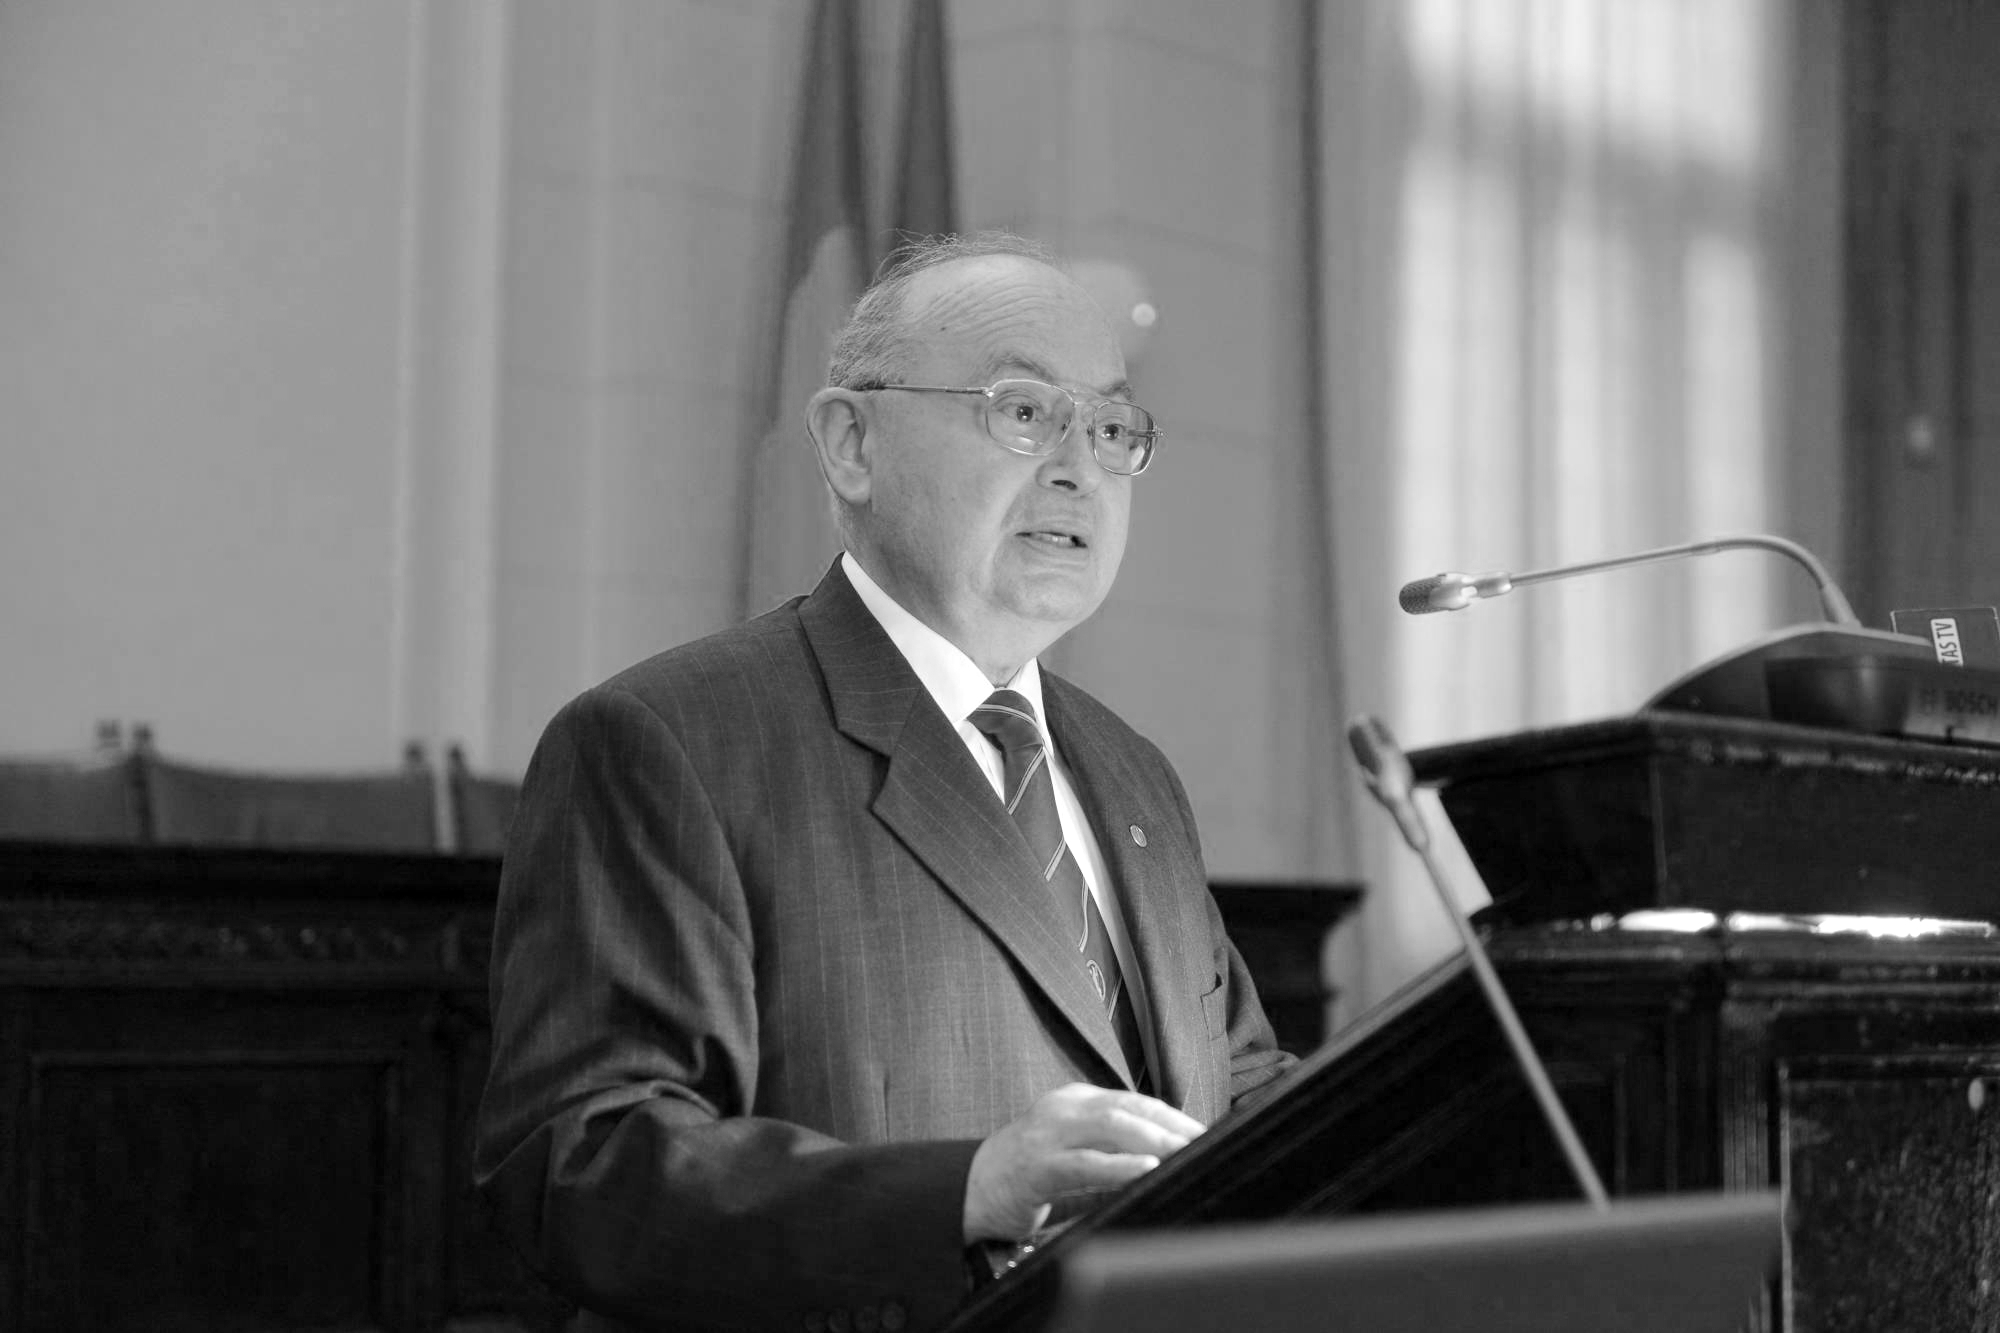 Ionel-Valentin Vlad discurs - Copy - Copy.jpg